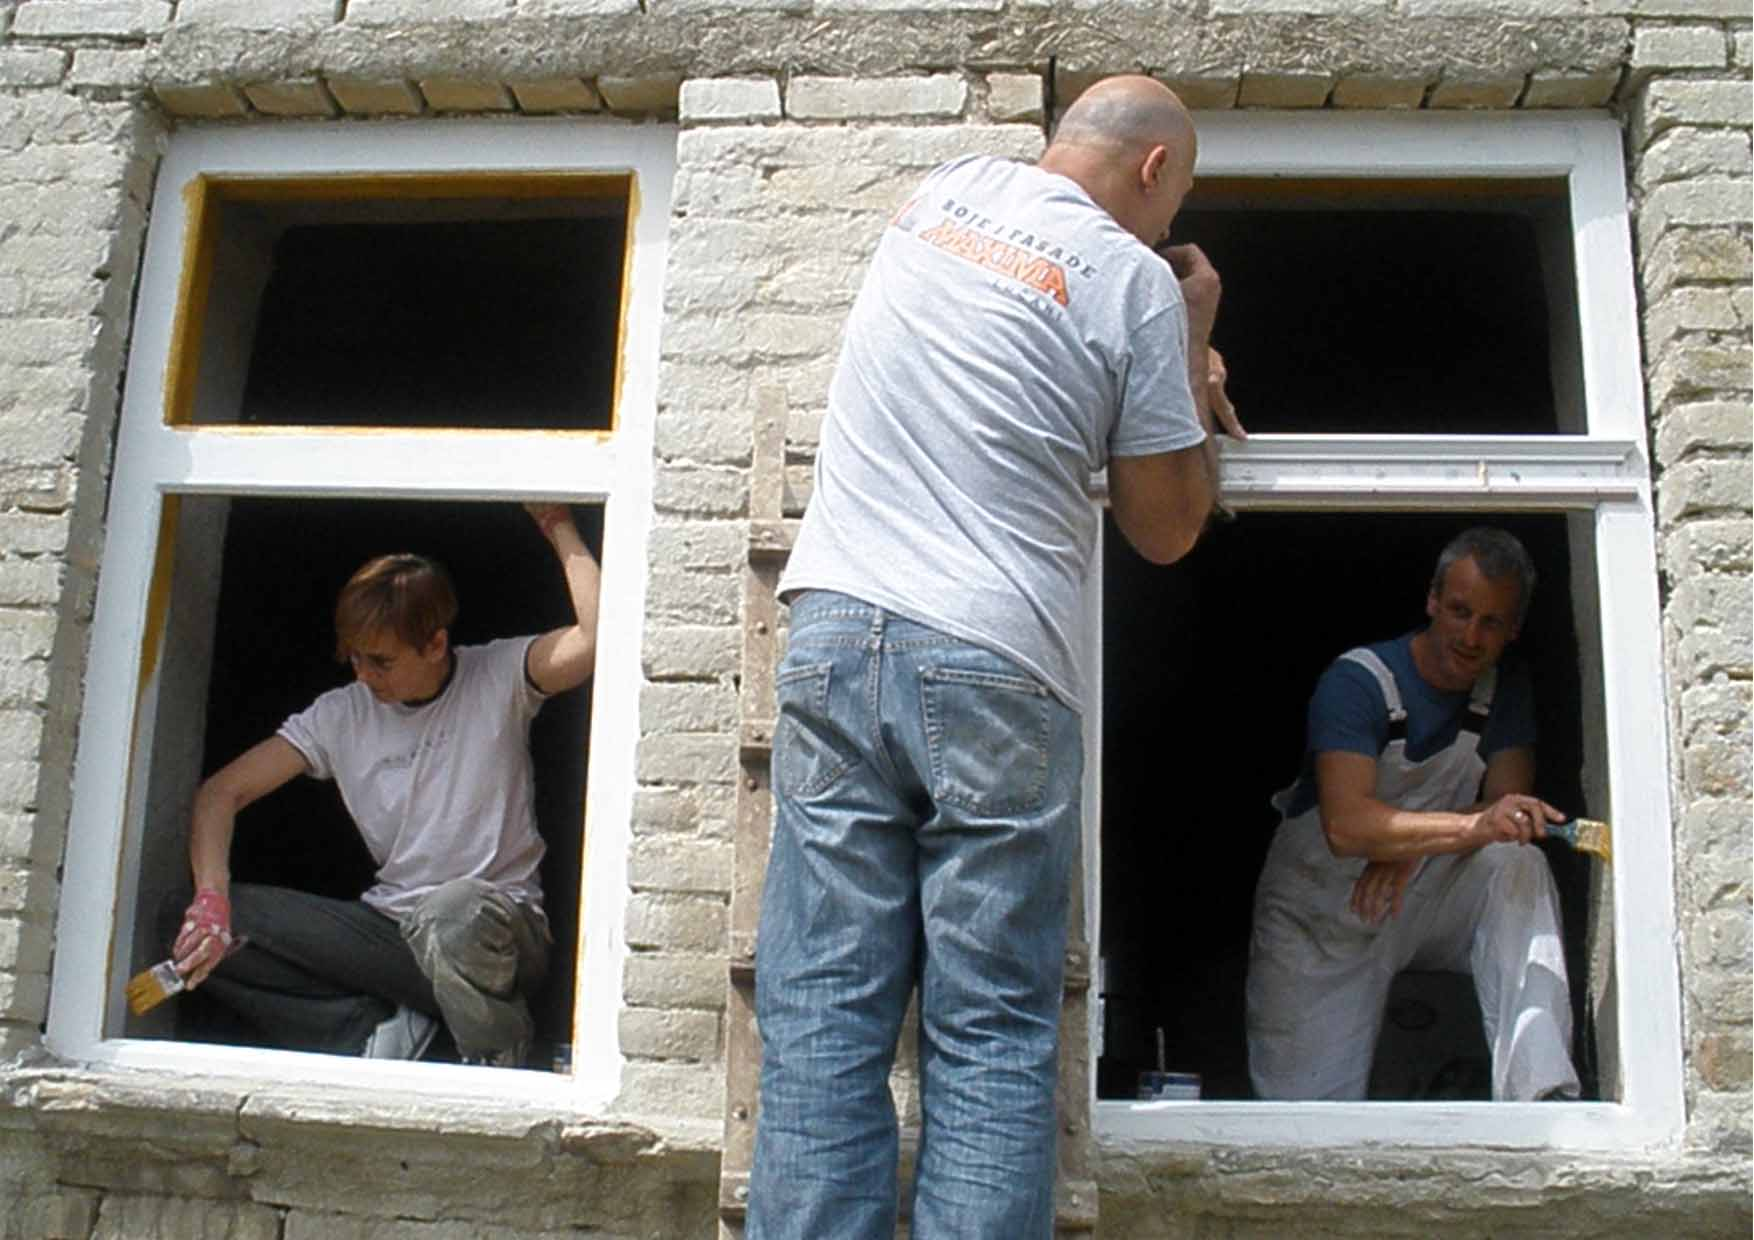 03 Mosorin radionica Gorjana i ekipa farbanje okvira vrata i prozora